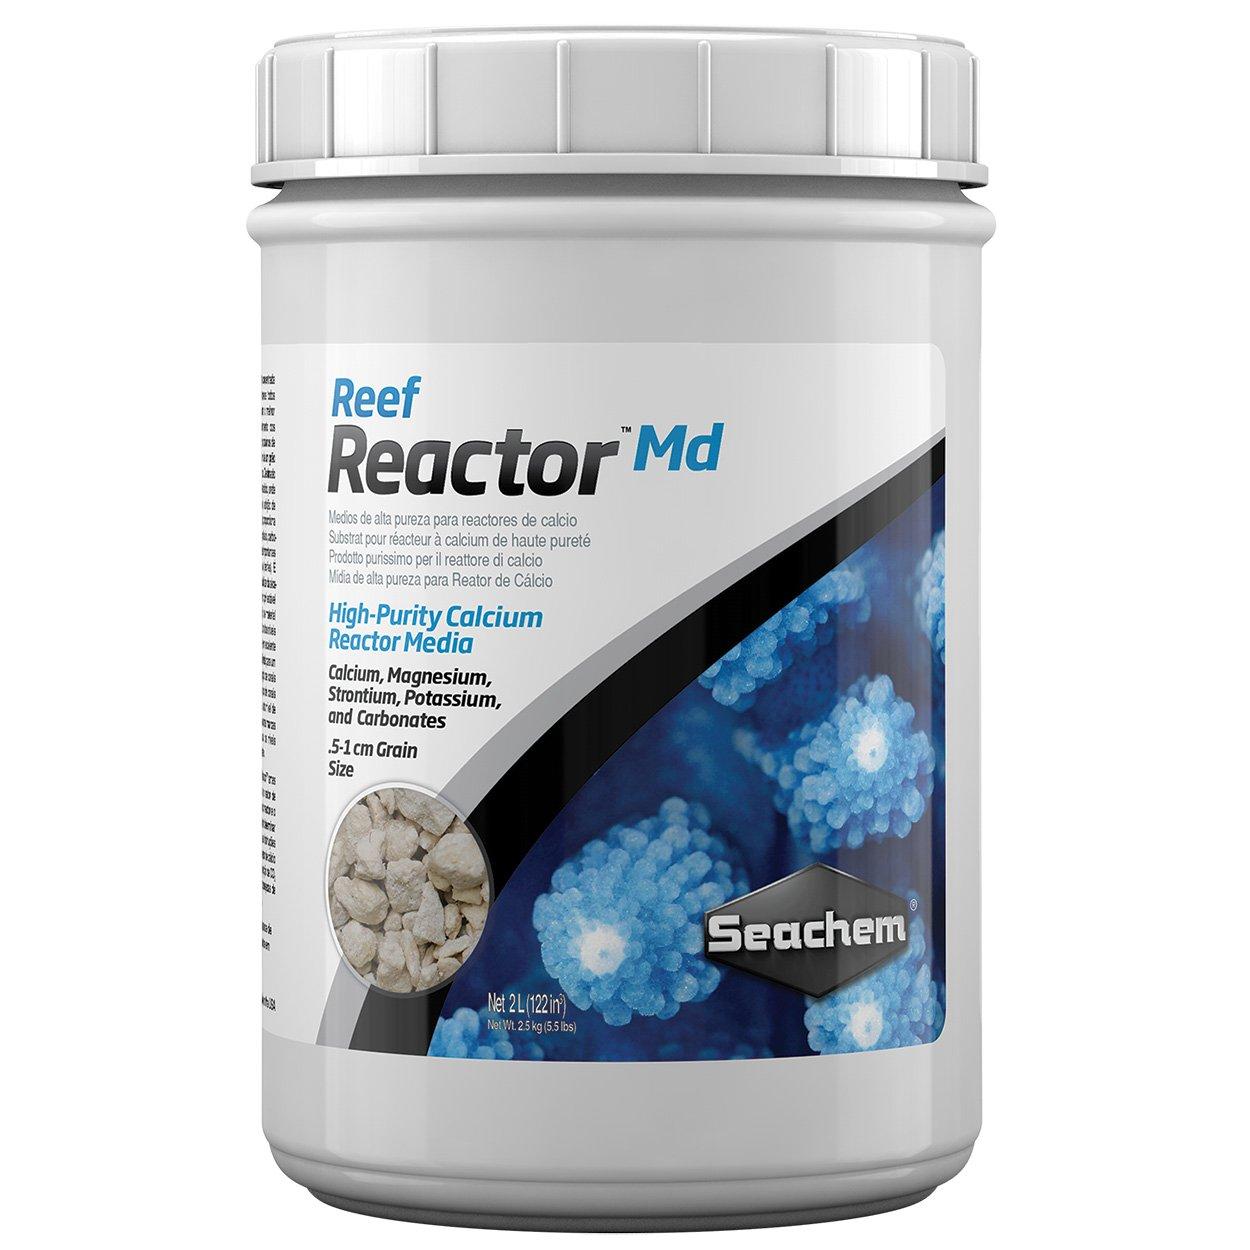 Seachem Reef Reactor Md for Saltwater 2L